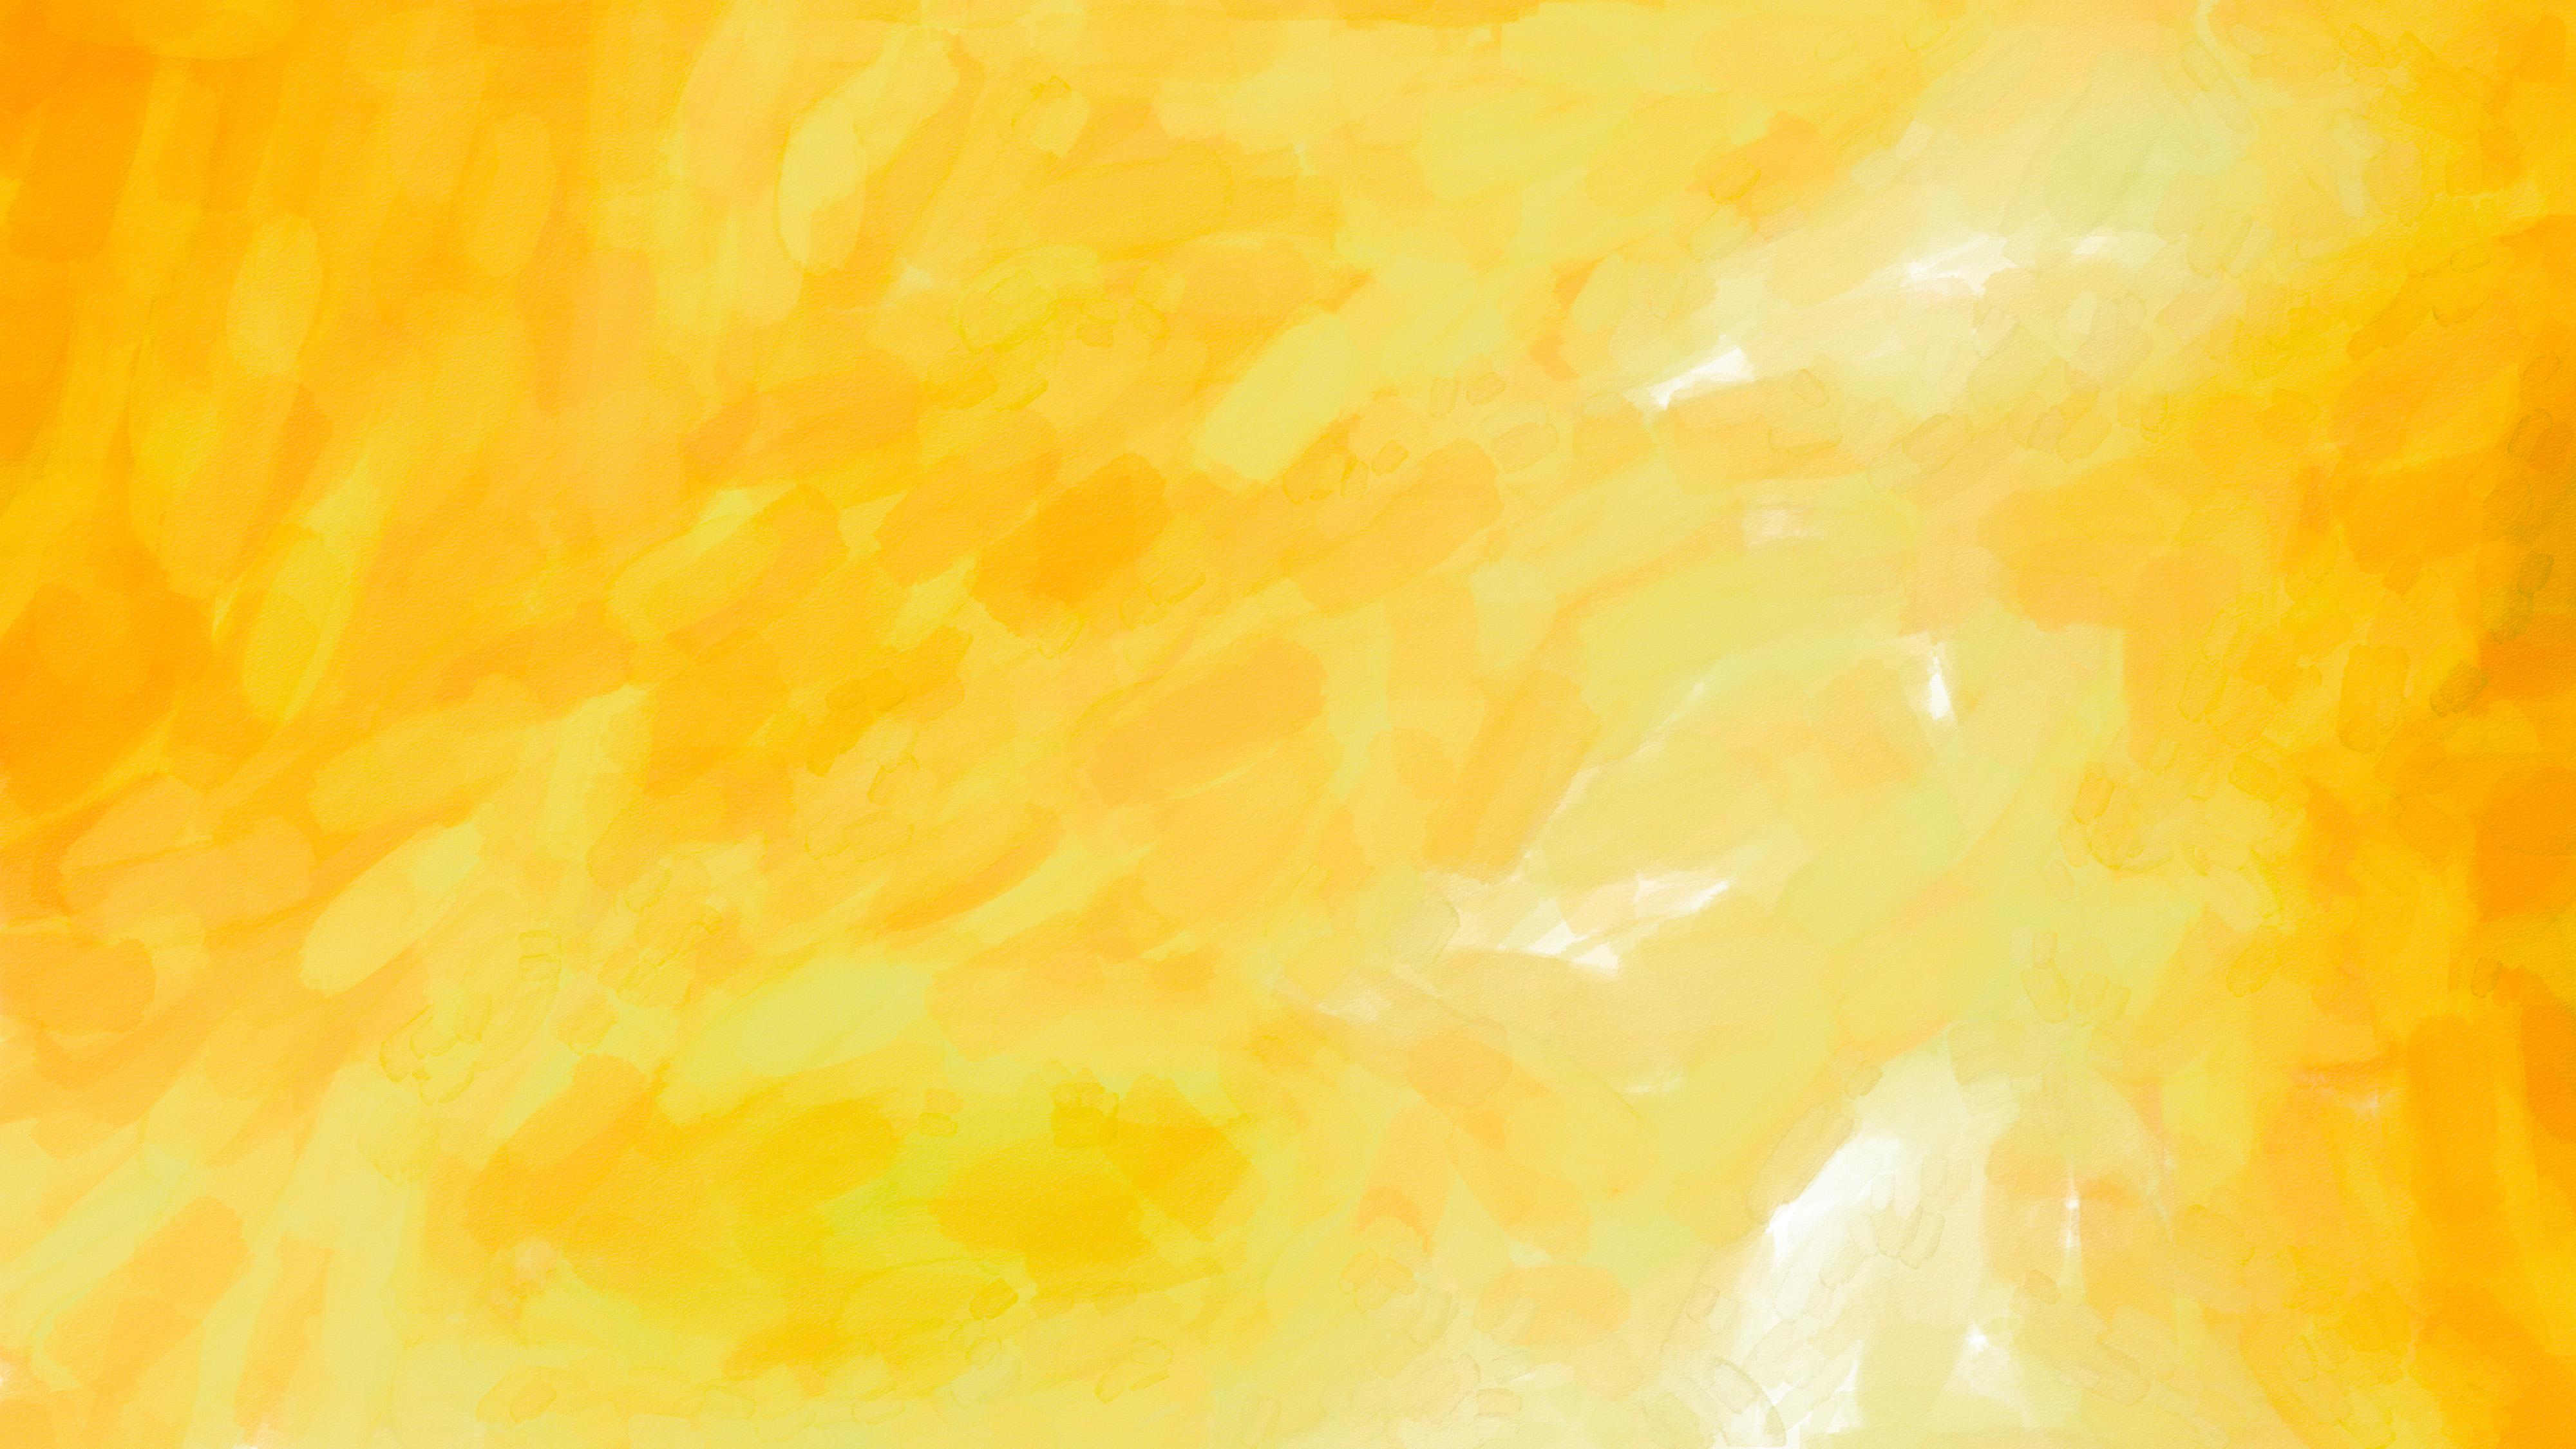 orange yellow peach free background image orange yellow peach free background image